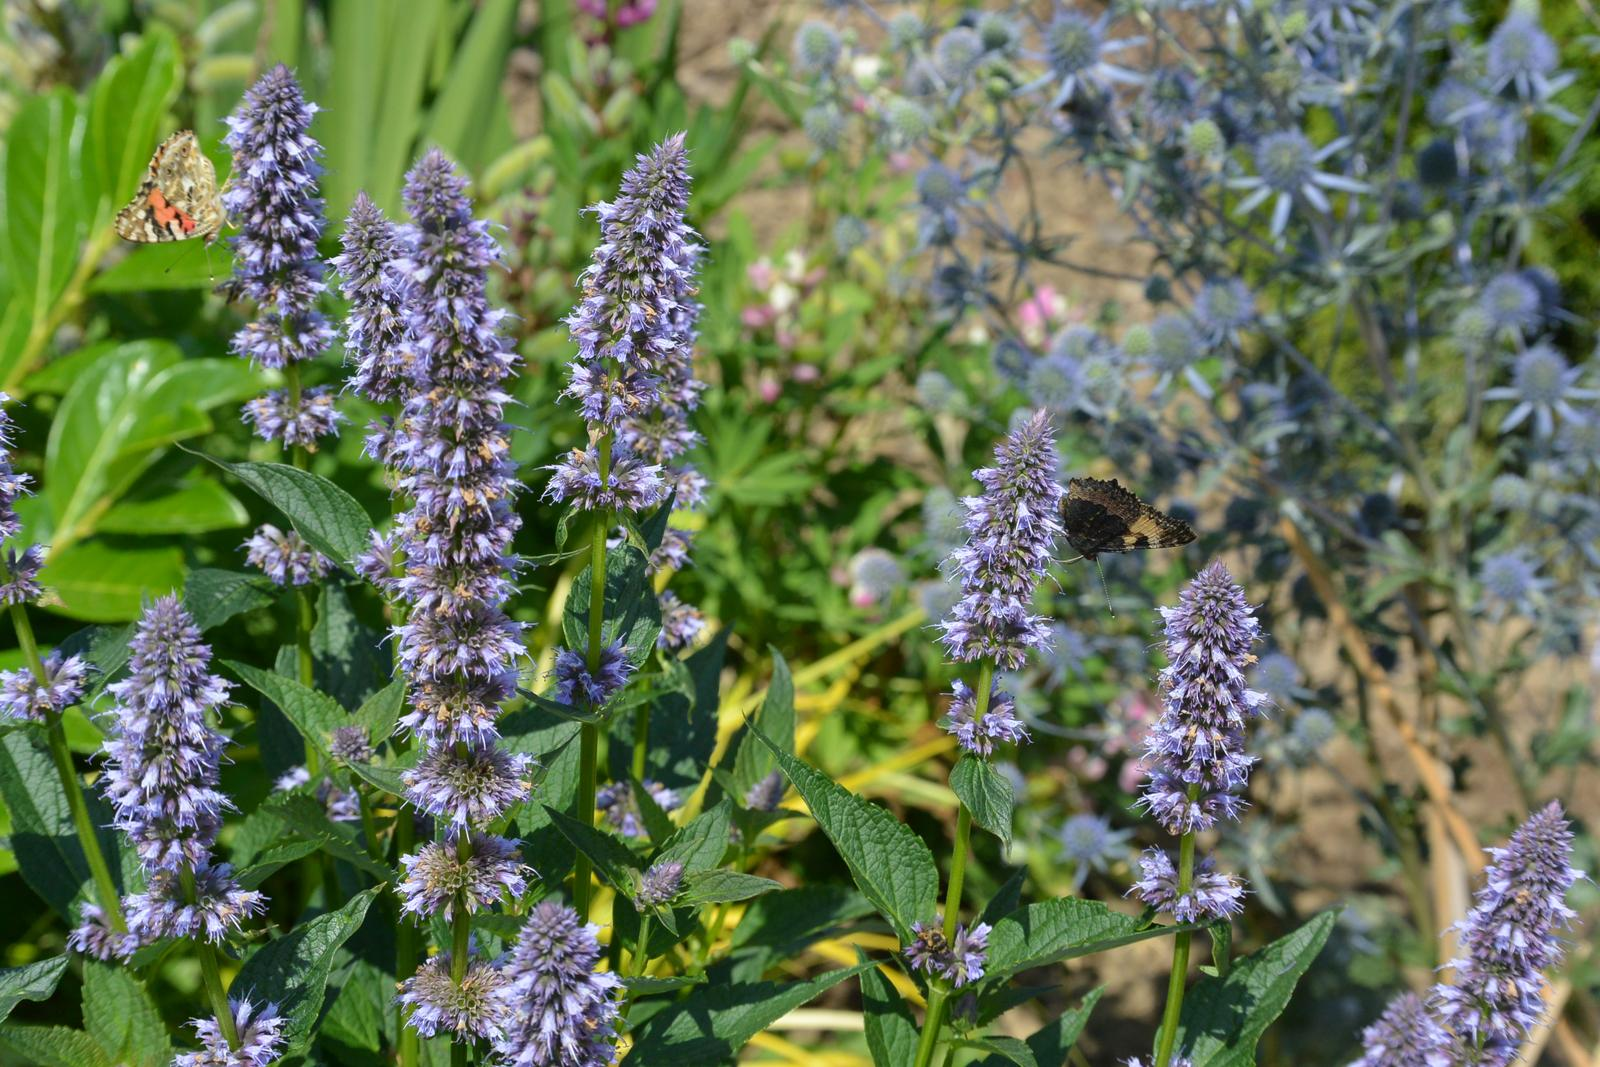 Motýlí zahrada 2019-2020 - Obrázek č. 17